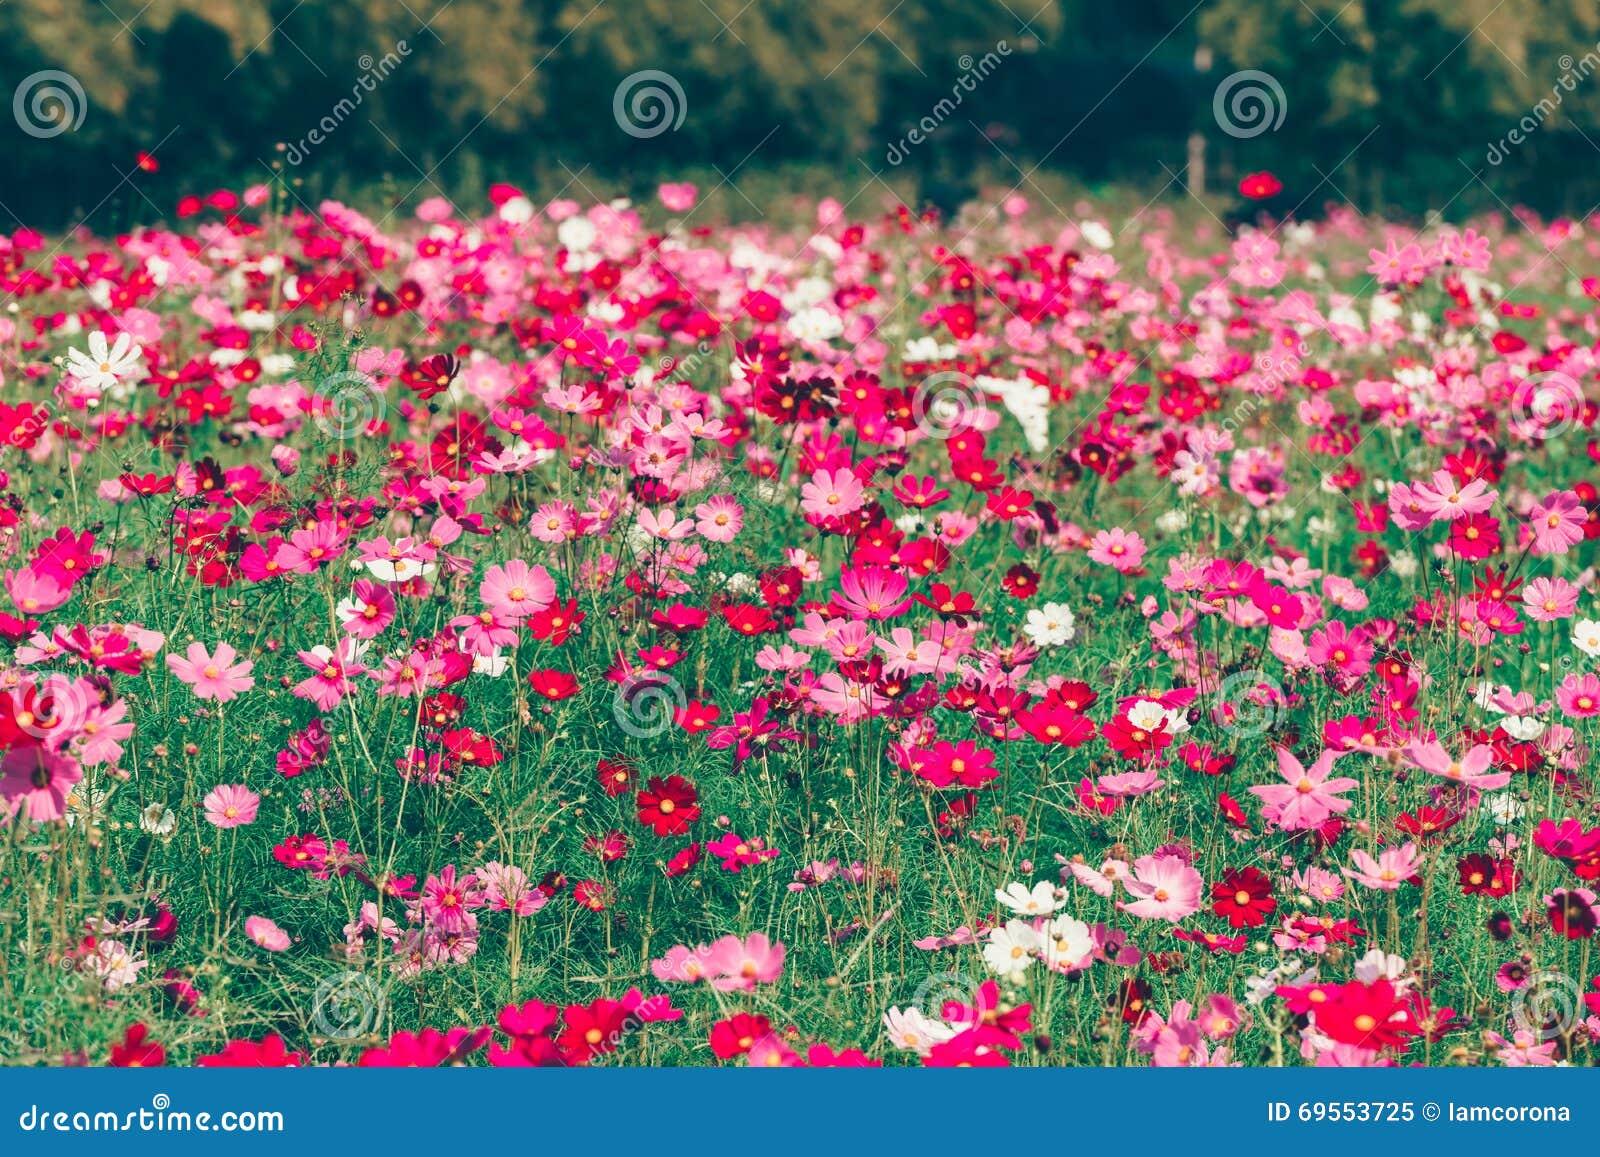 Jardin de fleurs rose et rouge de cosmos image stock for Fleurs de jardin